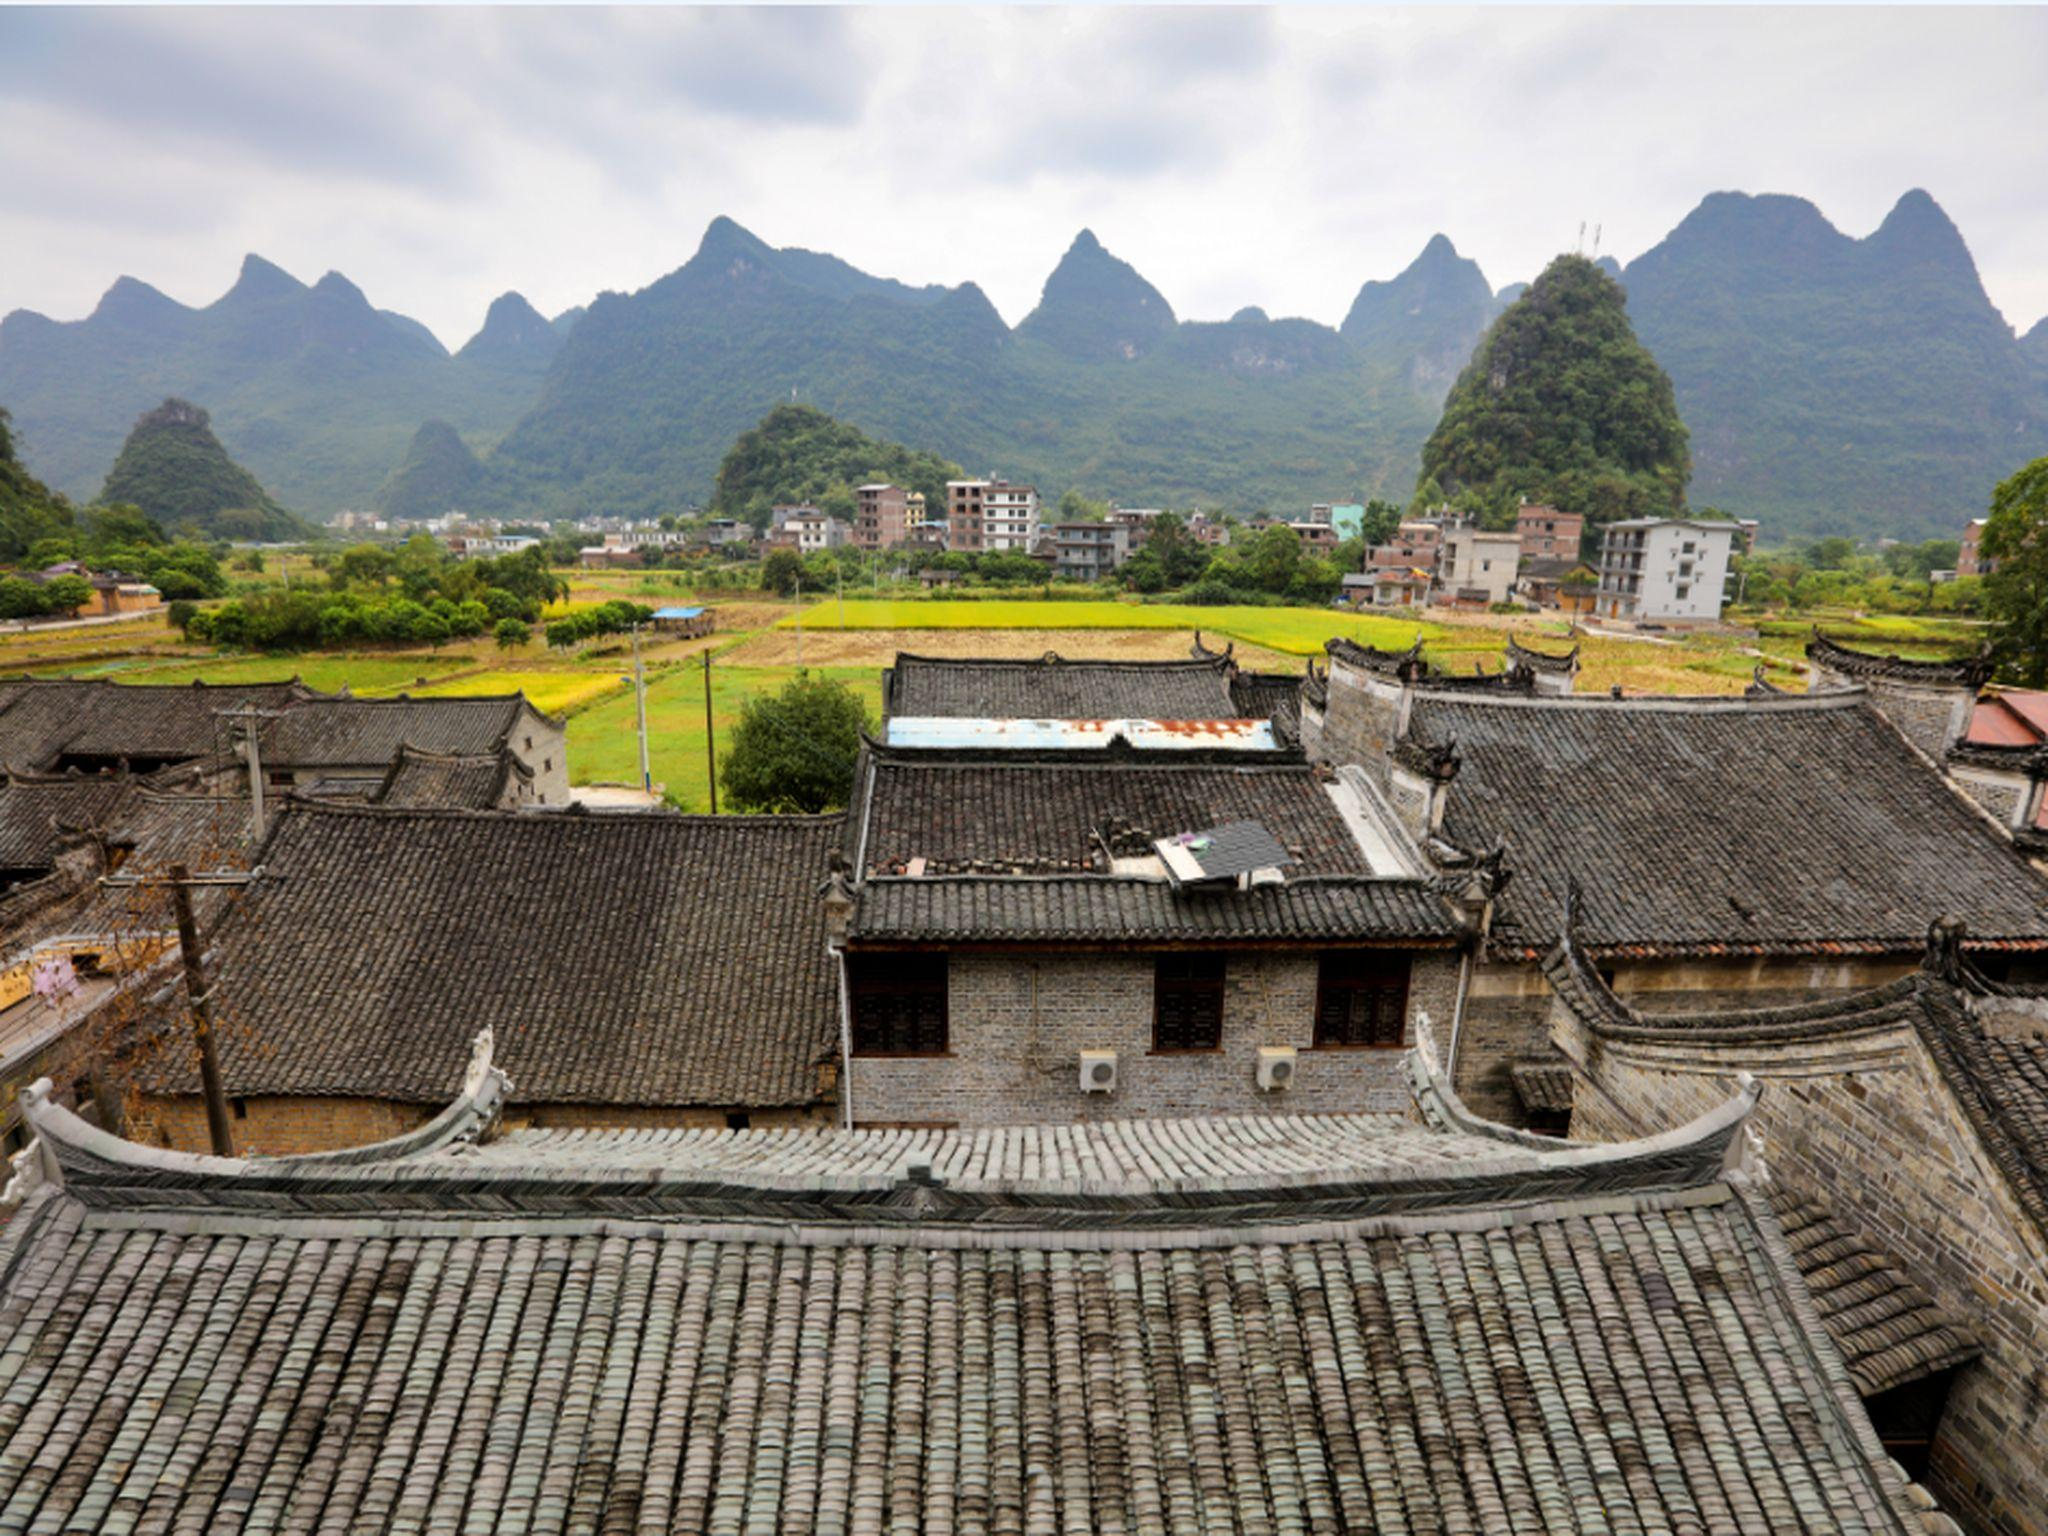 Yangshuo Fengguan Mountain Meilu Villeggiatura Inn